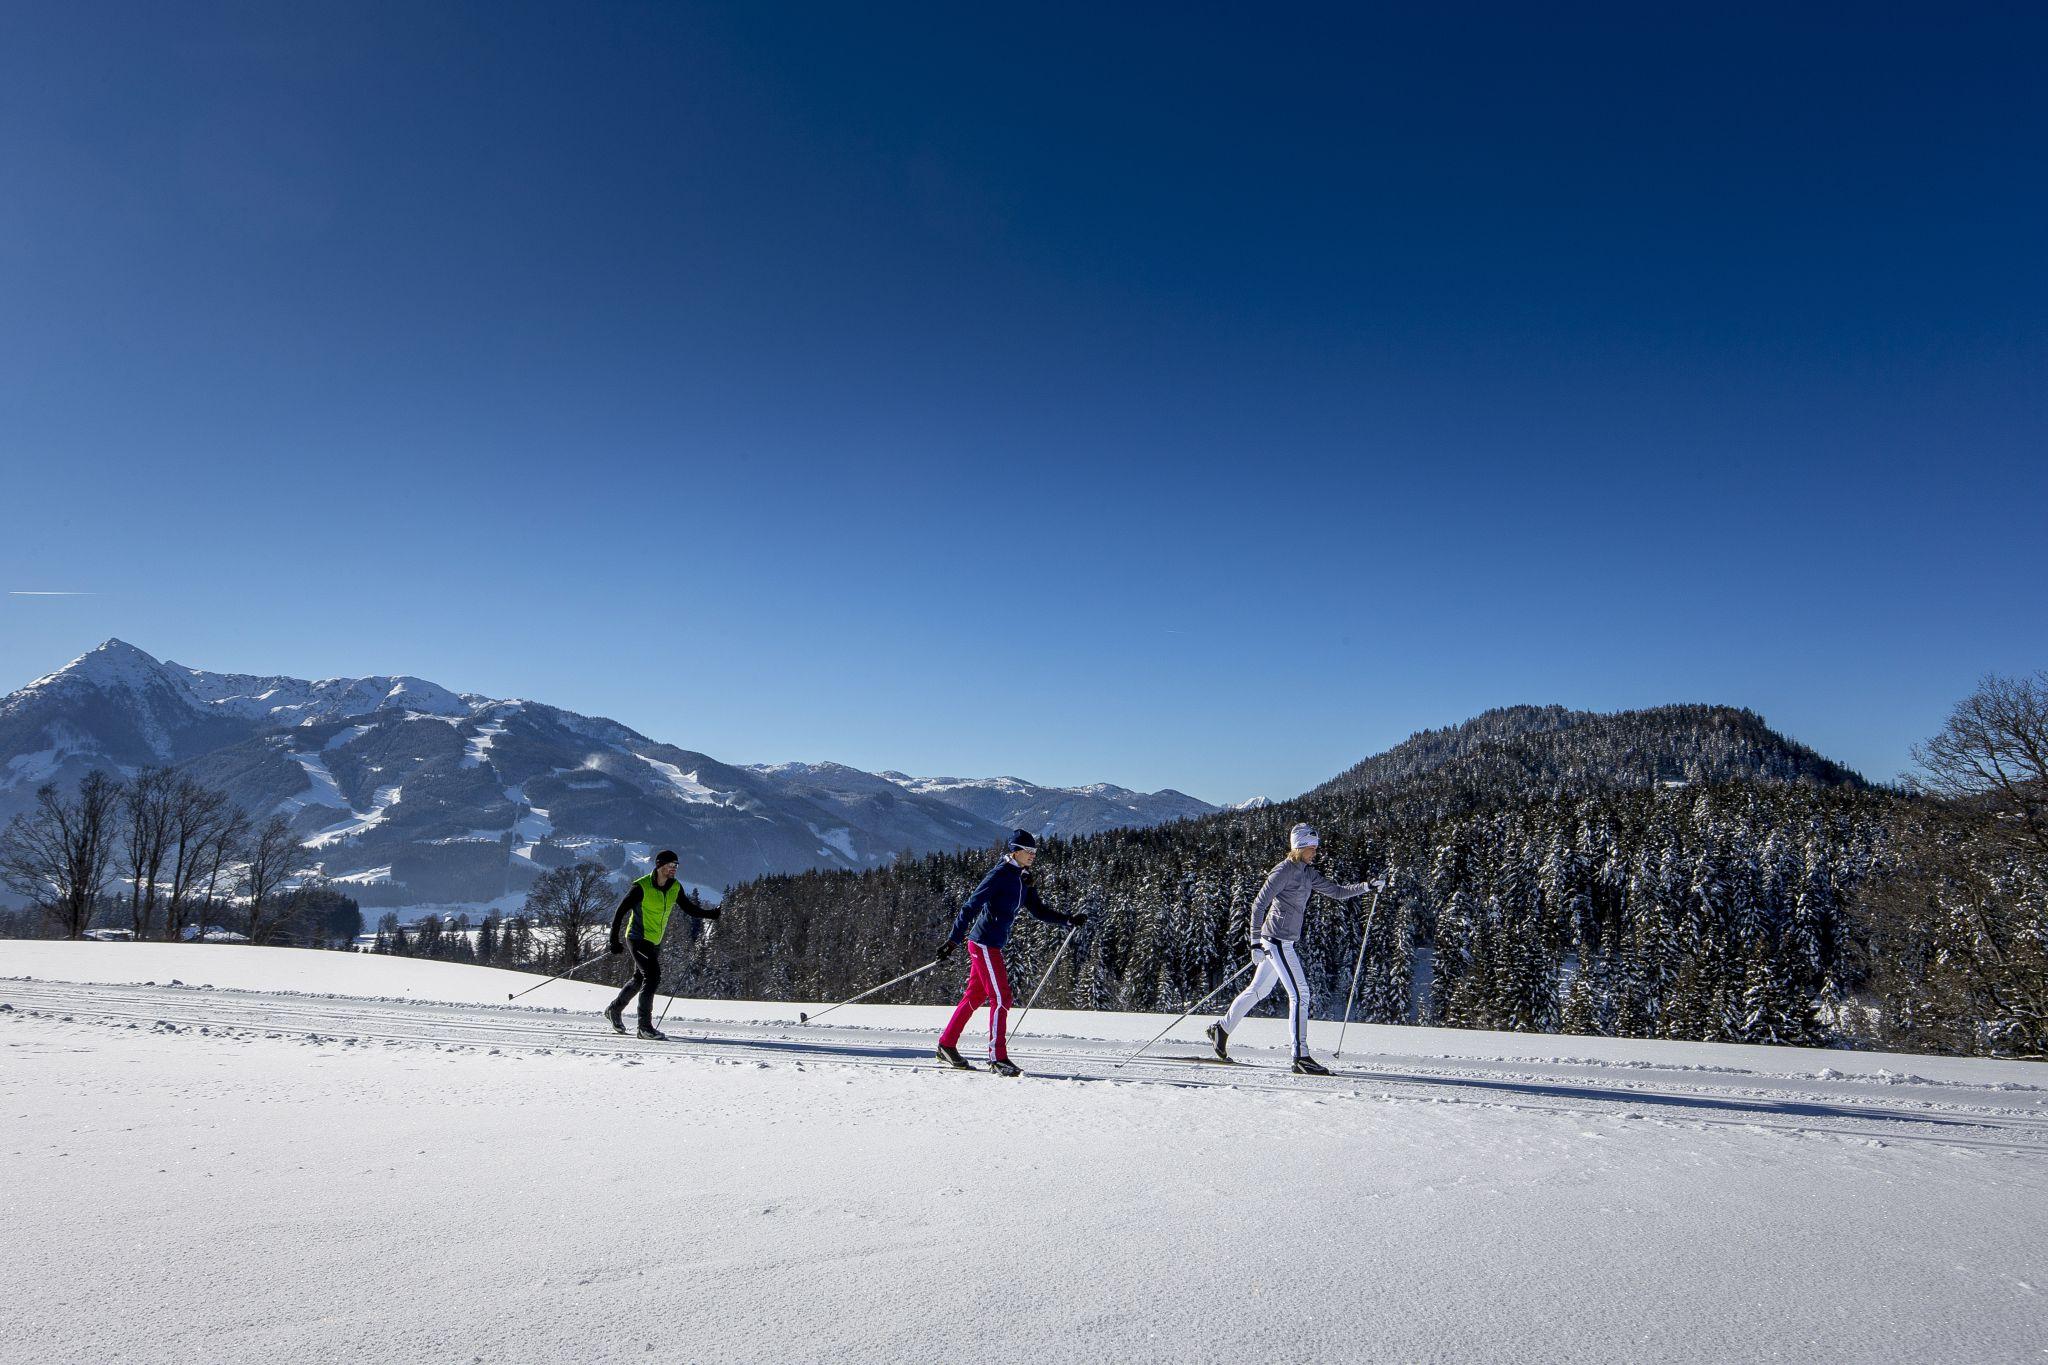 Cross Country Ski Holidays, Langlaufen in Ramsau am Dachstein, © Tom Lamm